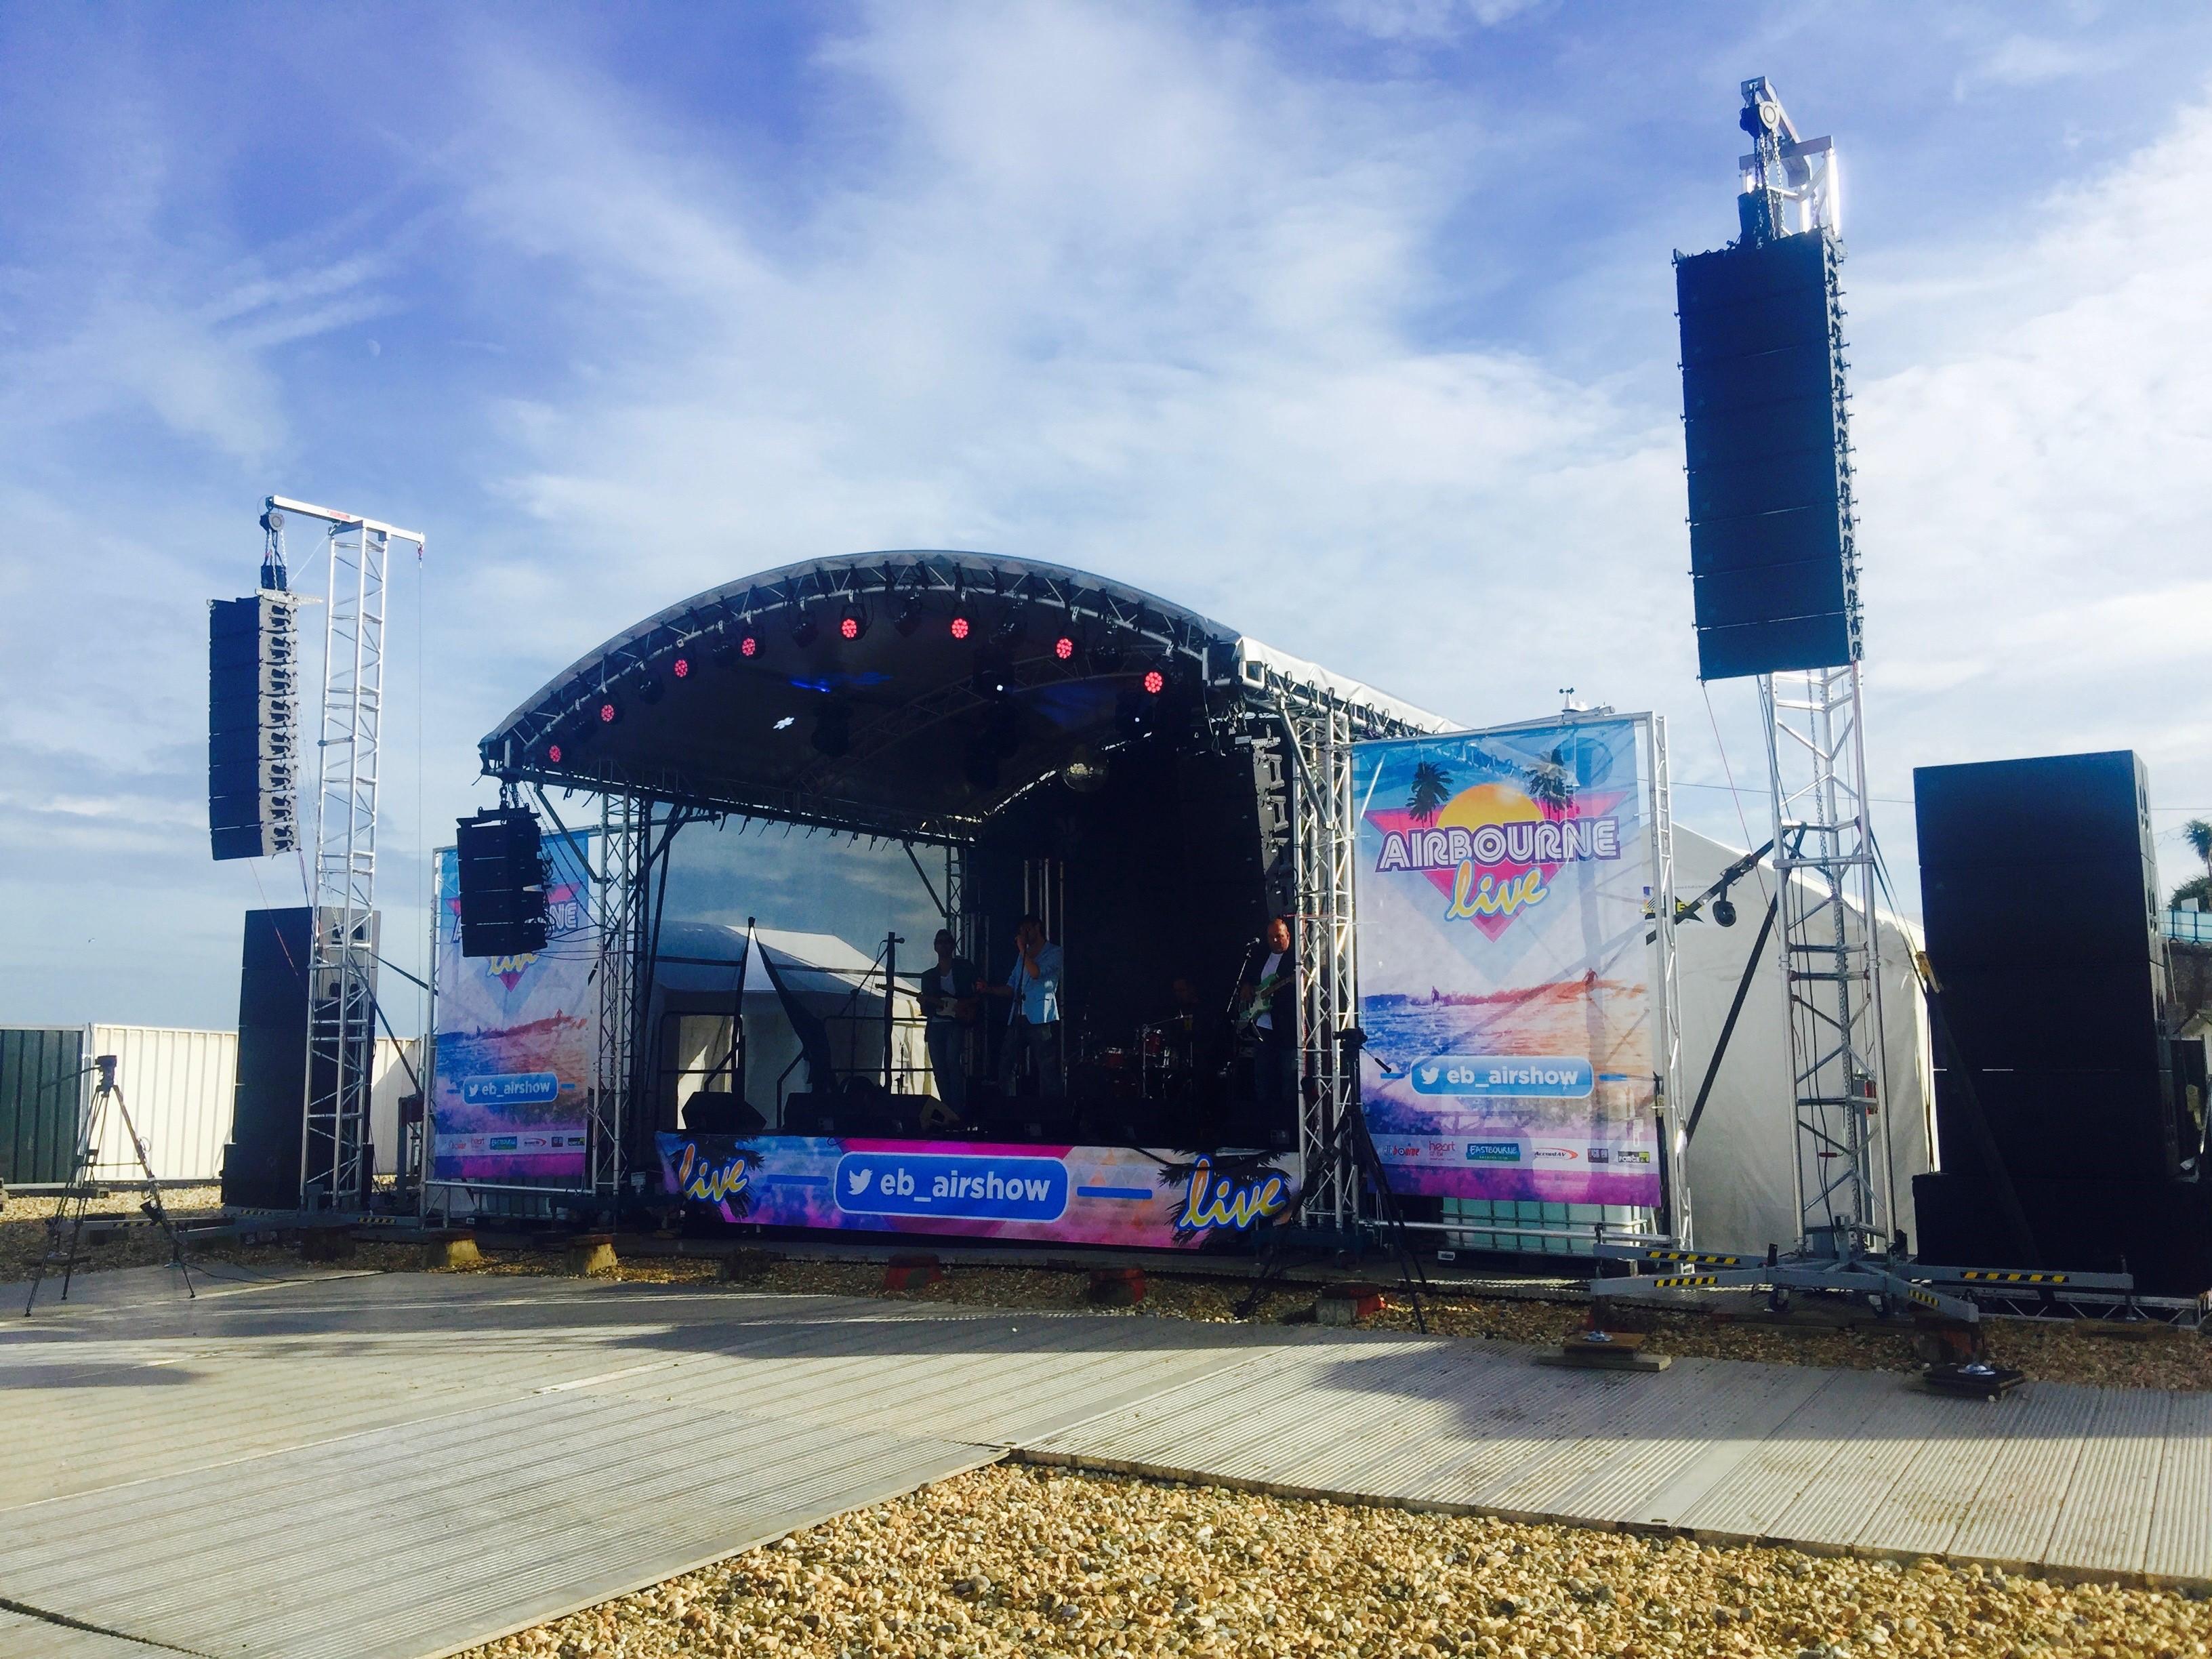 Live Stage Eastbourne Airbourne